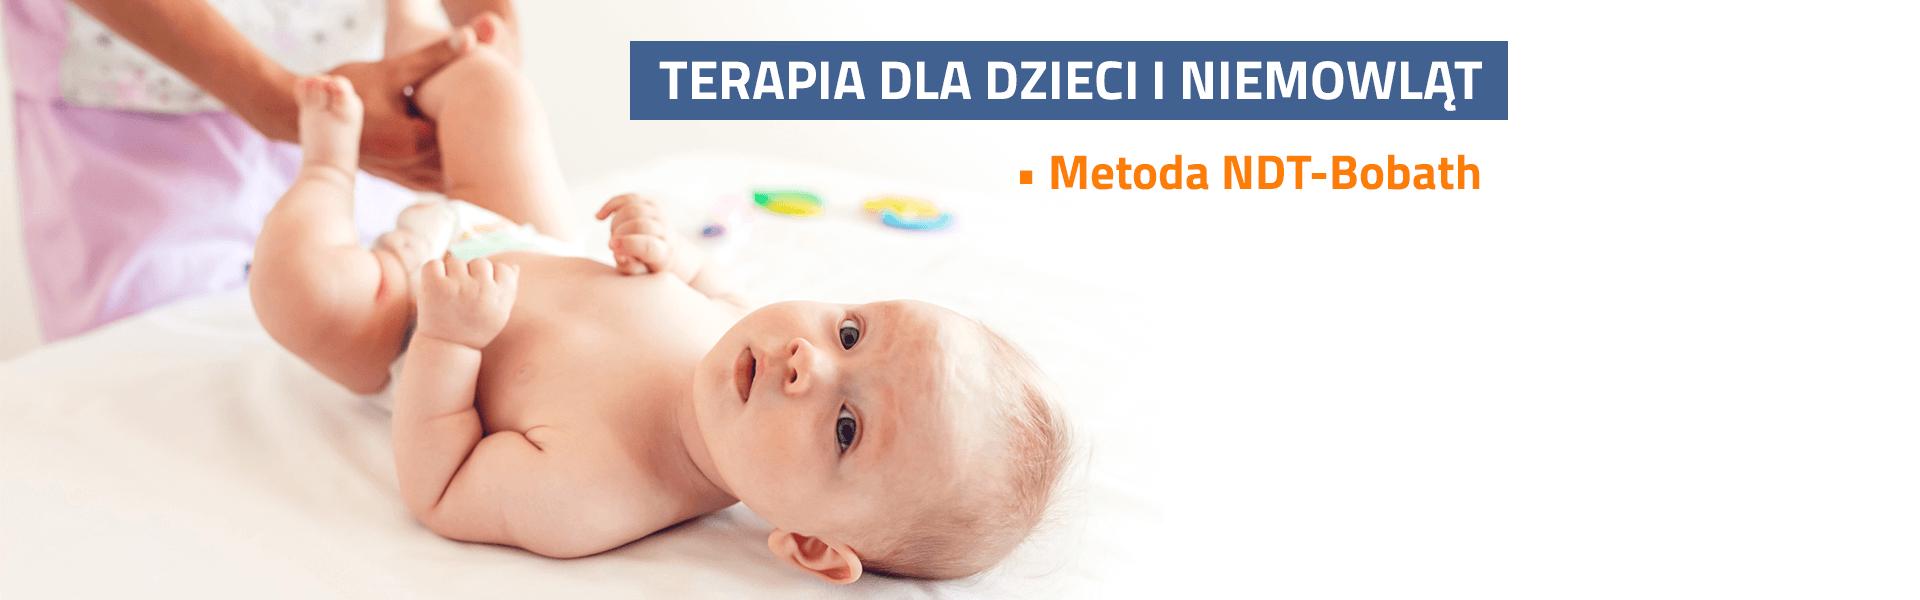 Medicamed-Terapia-dla-dzieci-i-niemowląt-slider